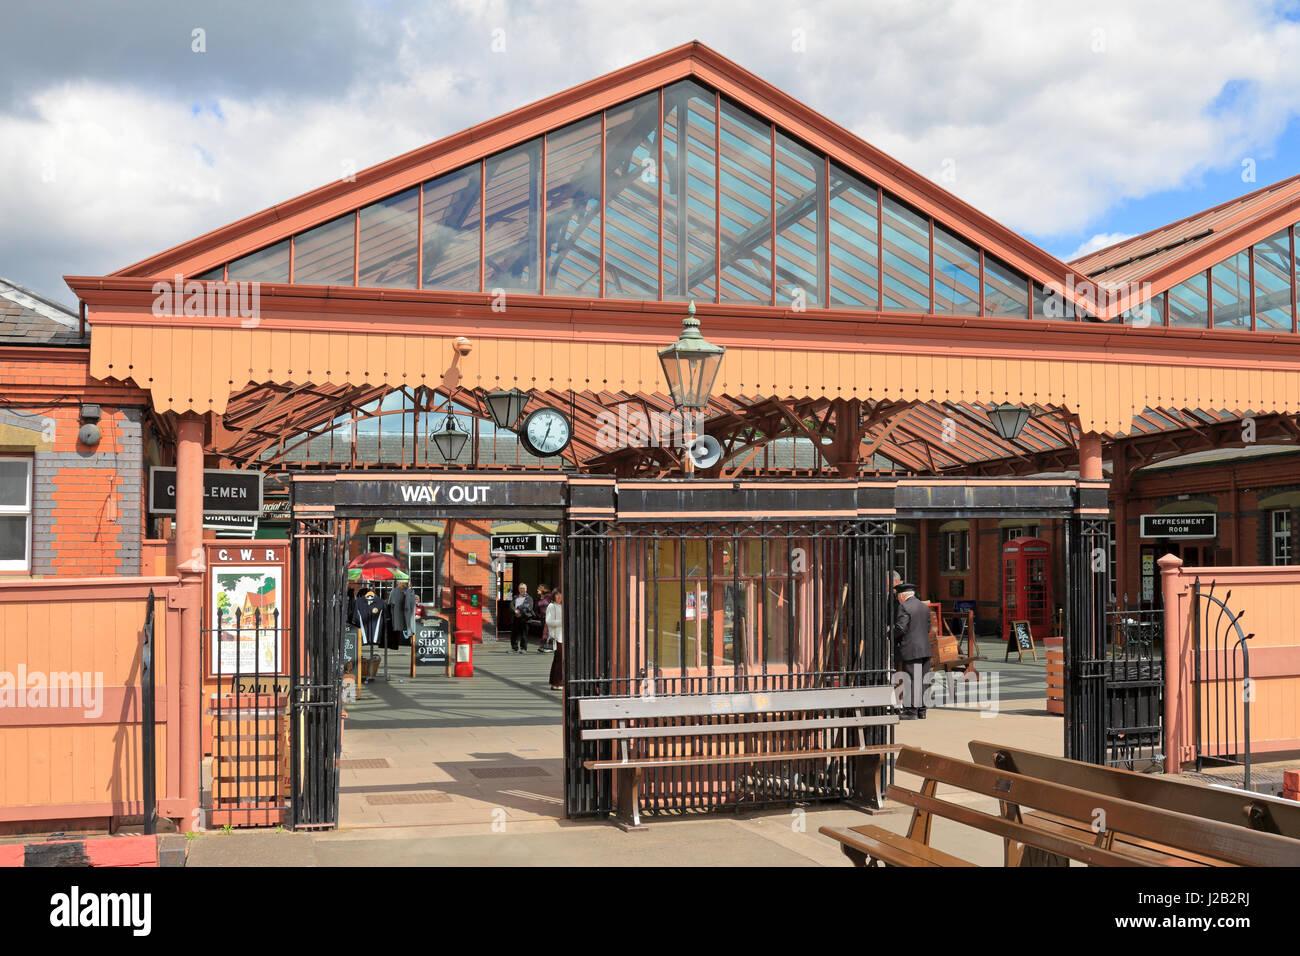 Kidderminster Railway Station from the platforms, Kidderminster, Shropshire, England, UK. - Stock Image